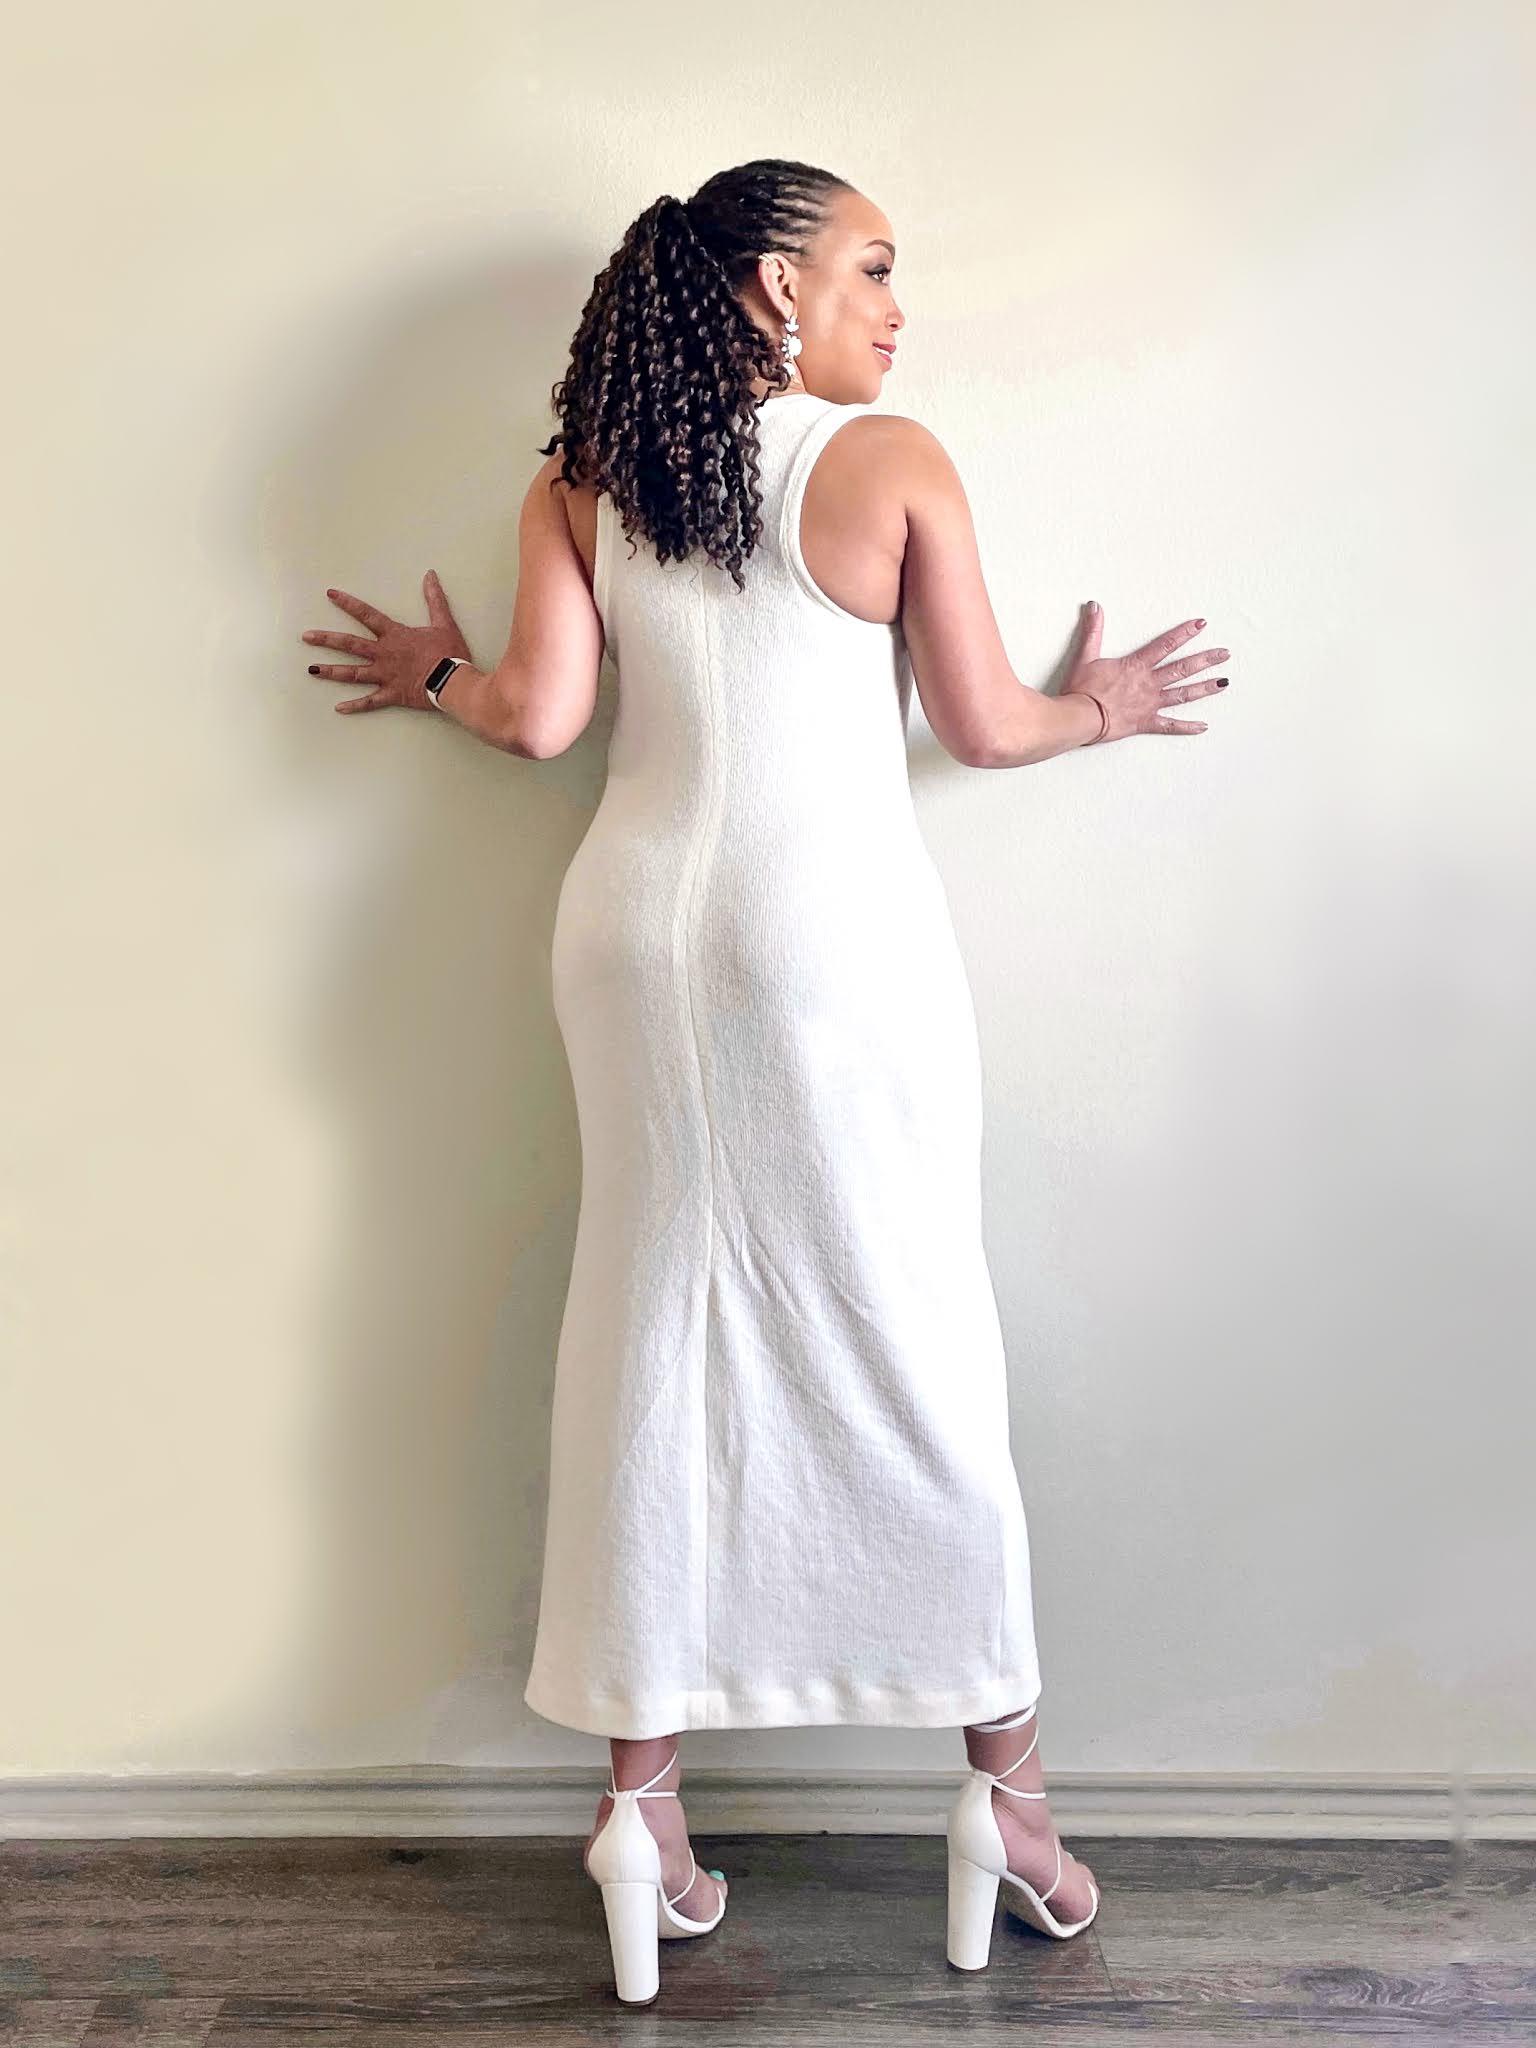 New Look 6210 - Rib Knit Maxi Dress - Erica Bunker DIY Style x Zelouf Fabrics